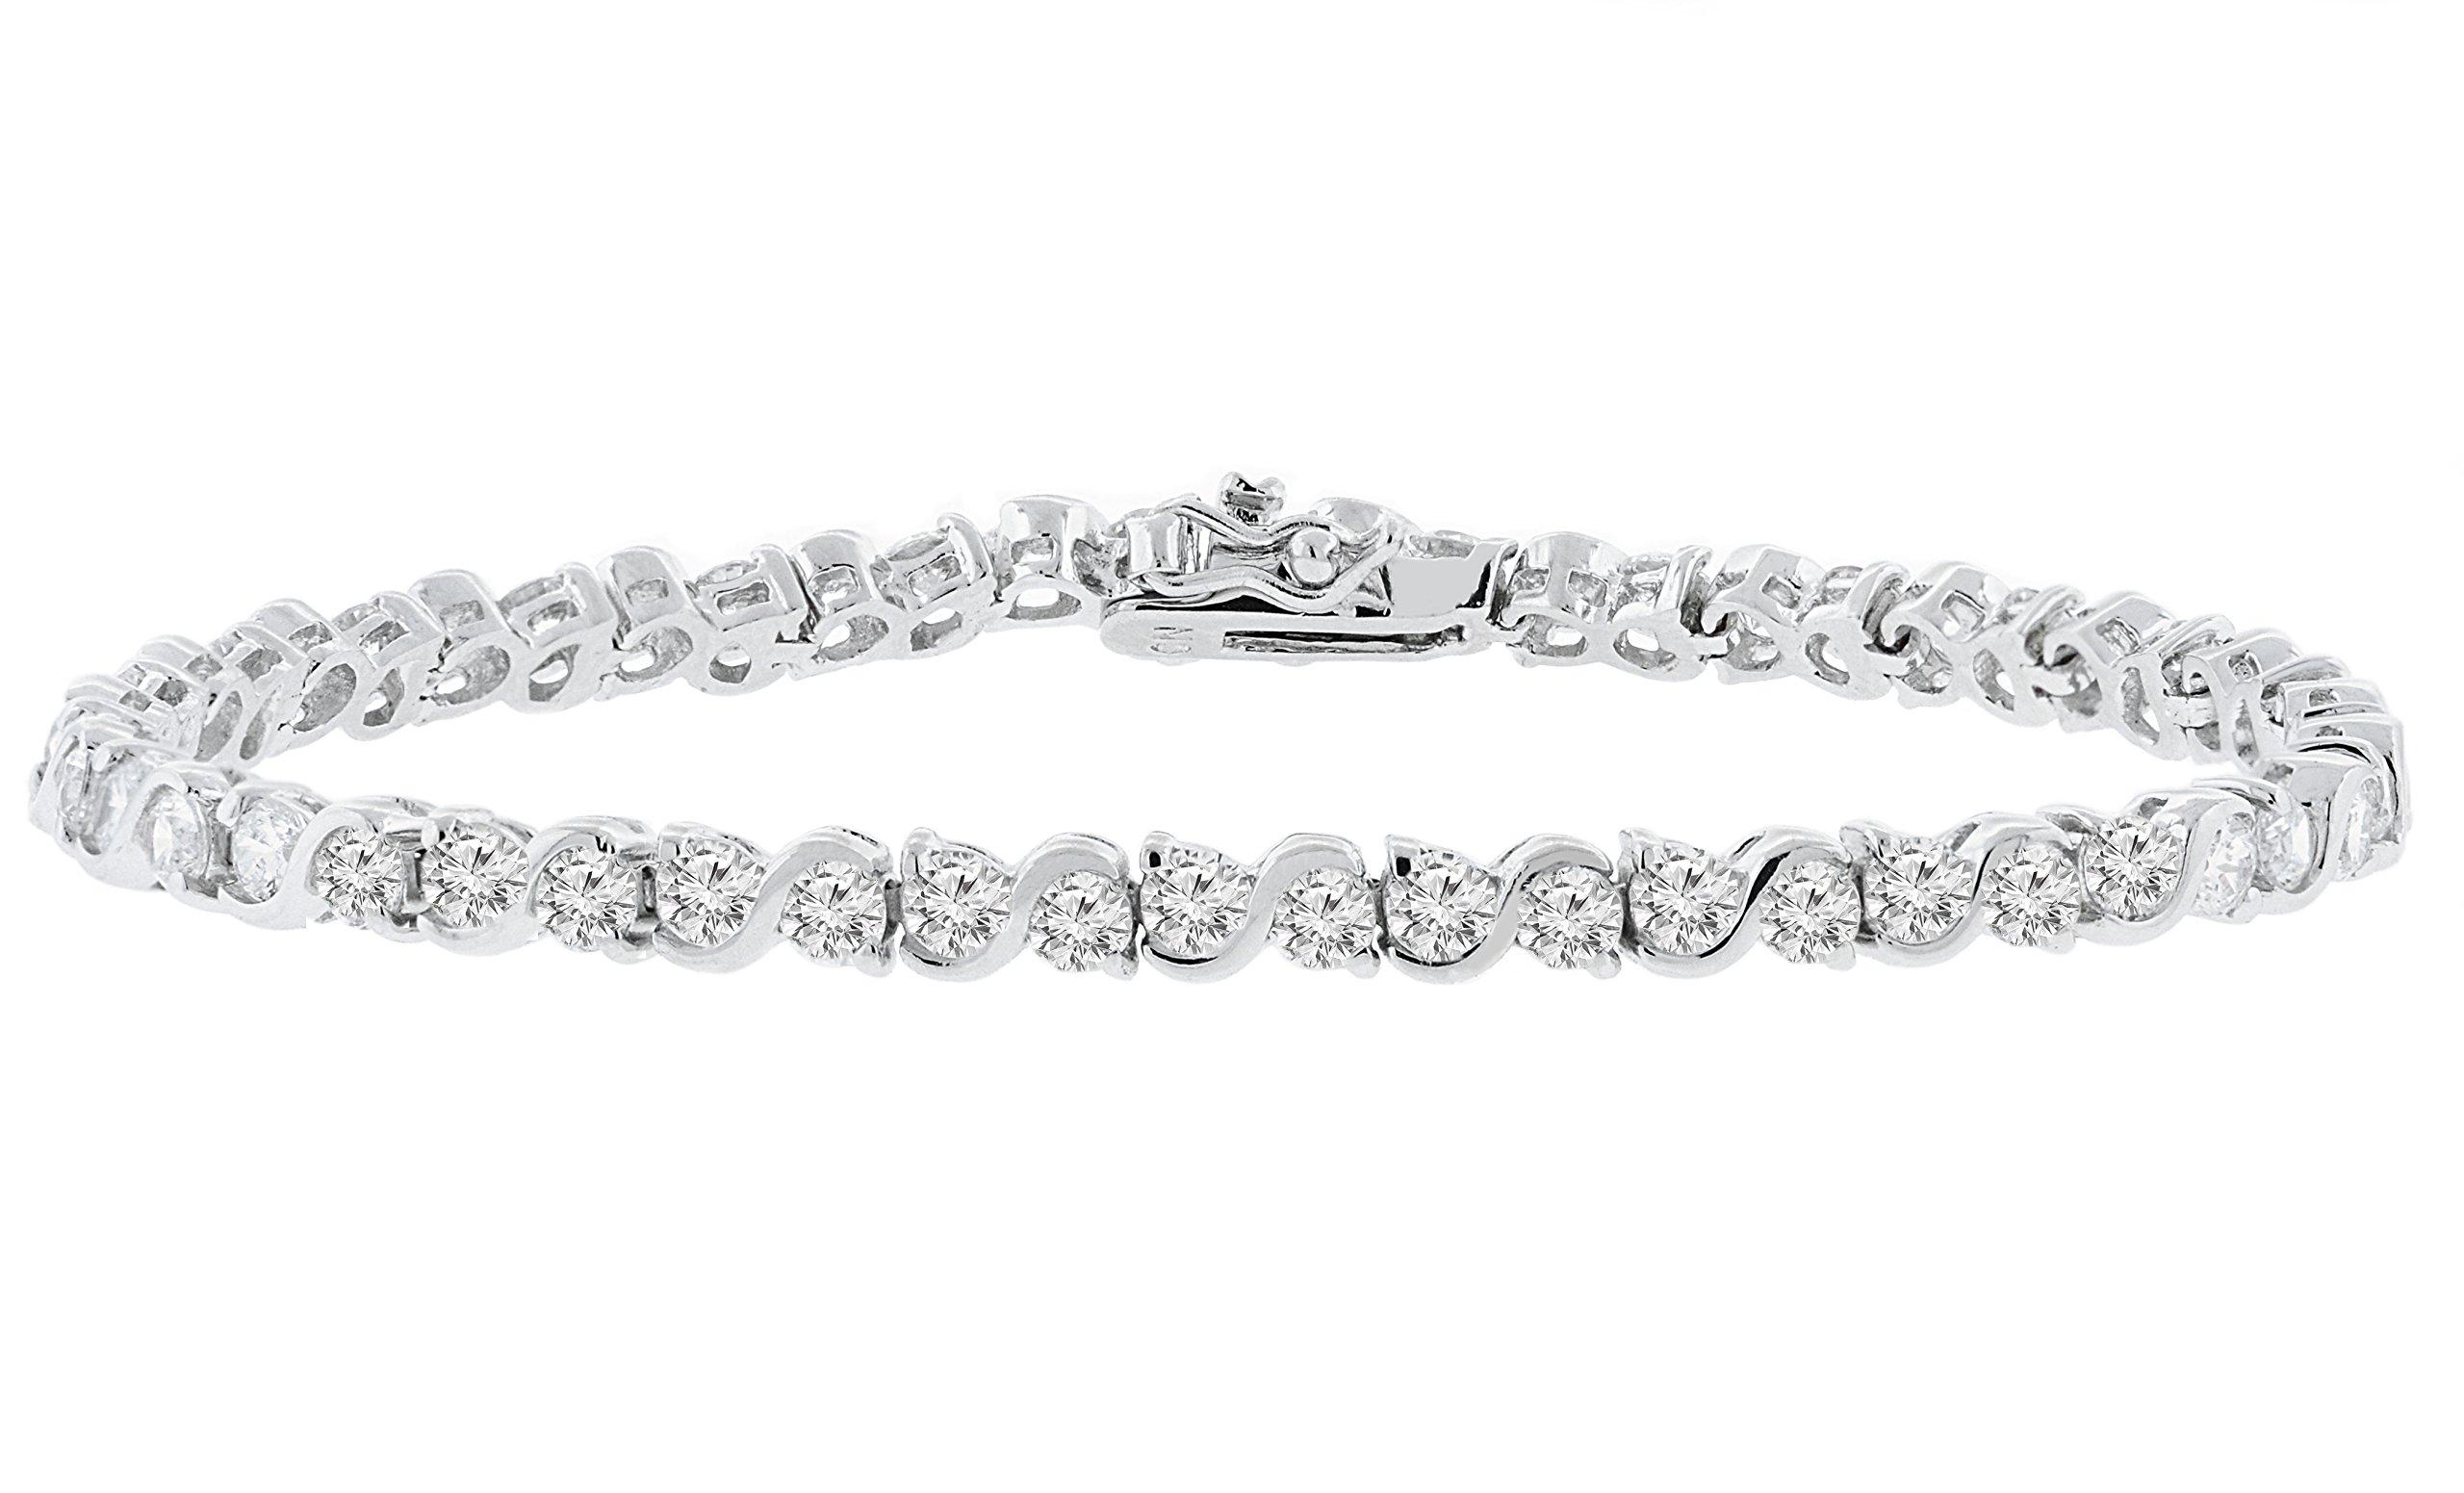 Cate & Chloe Ezra 7.5'' 18k Infinity Tennis Bracelet, White Gold Plated Bangle Bracelet with Unique Infinity Chain Design & CZ Stones, Sparkling Tennis Bracelets for Women, MSRP - $170